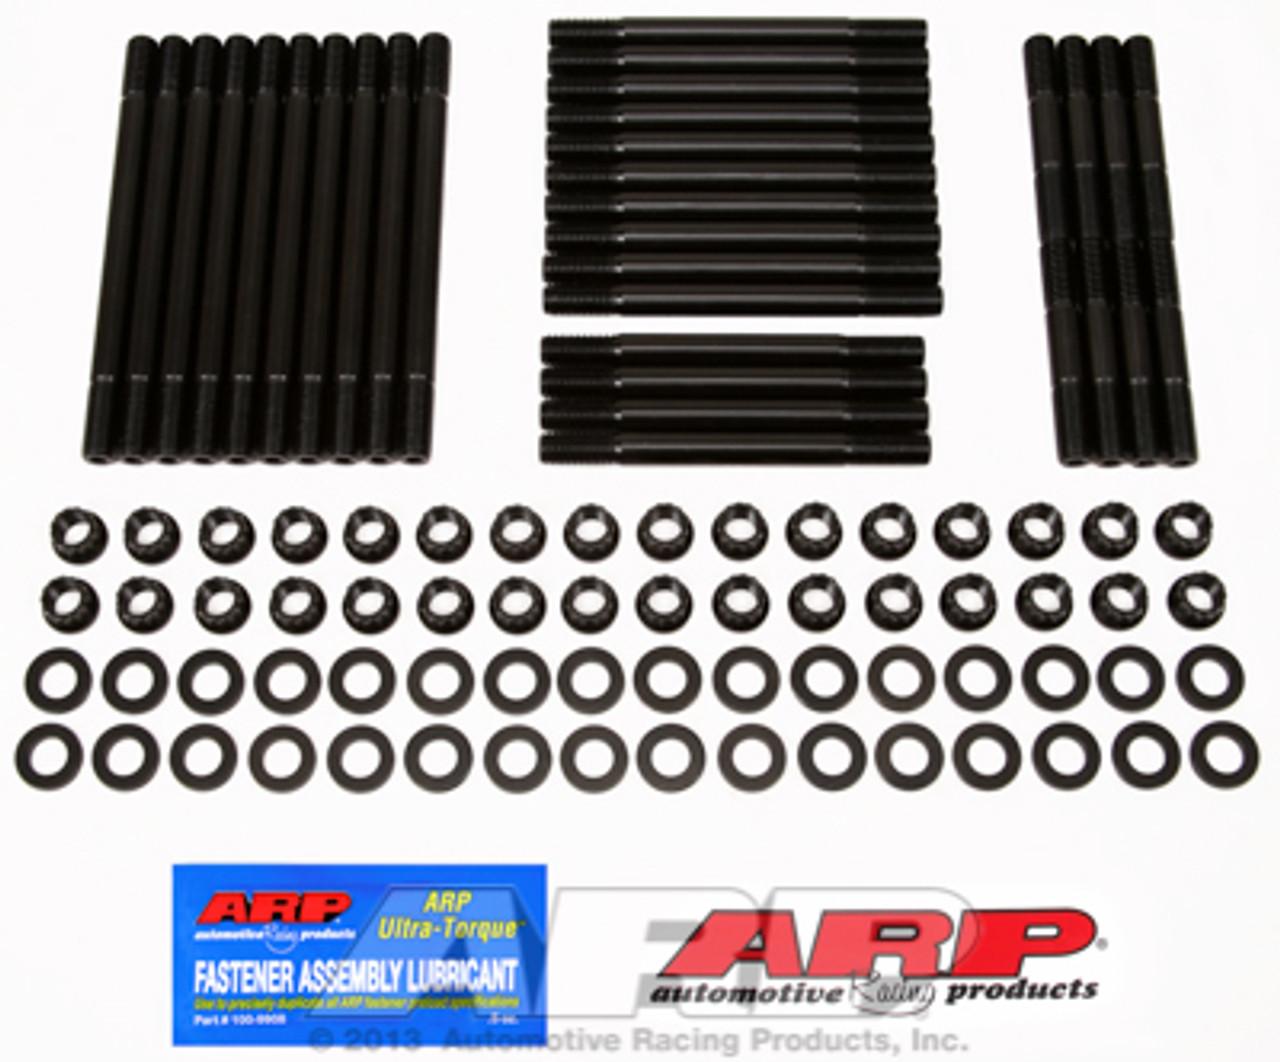 ARP Bolts Bb Chevy Brodix 12Pt Head Stud Kit